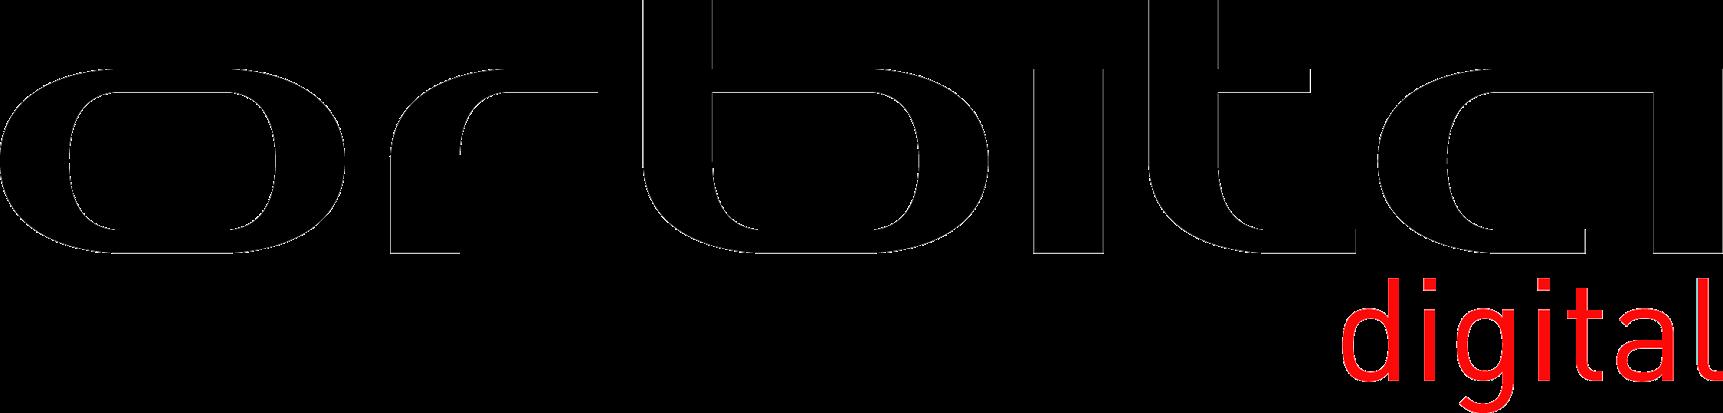 Órbita Digital